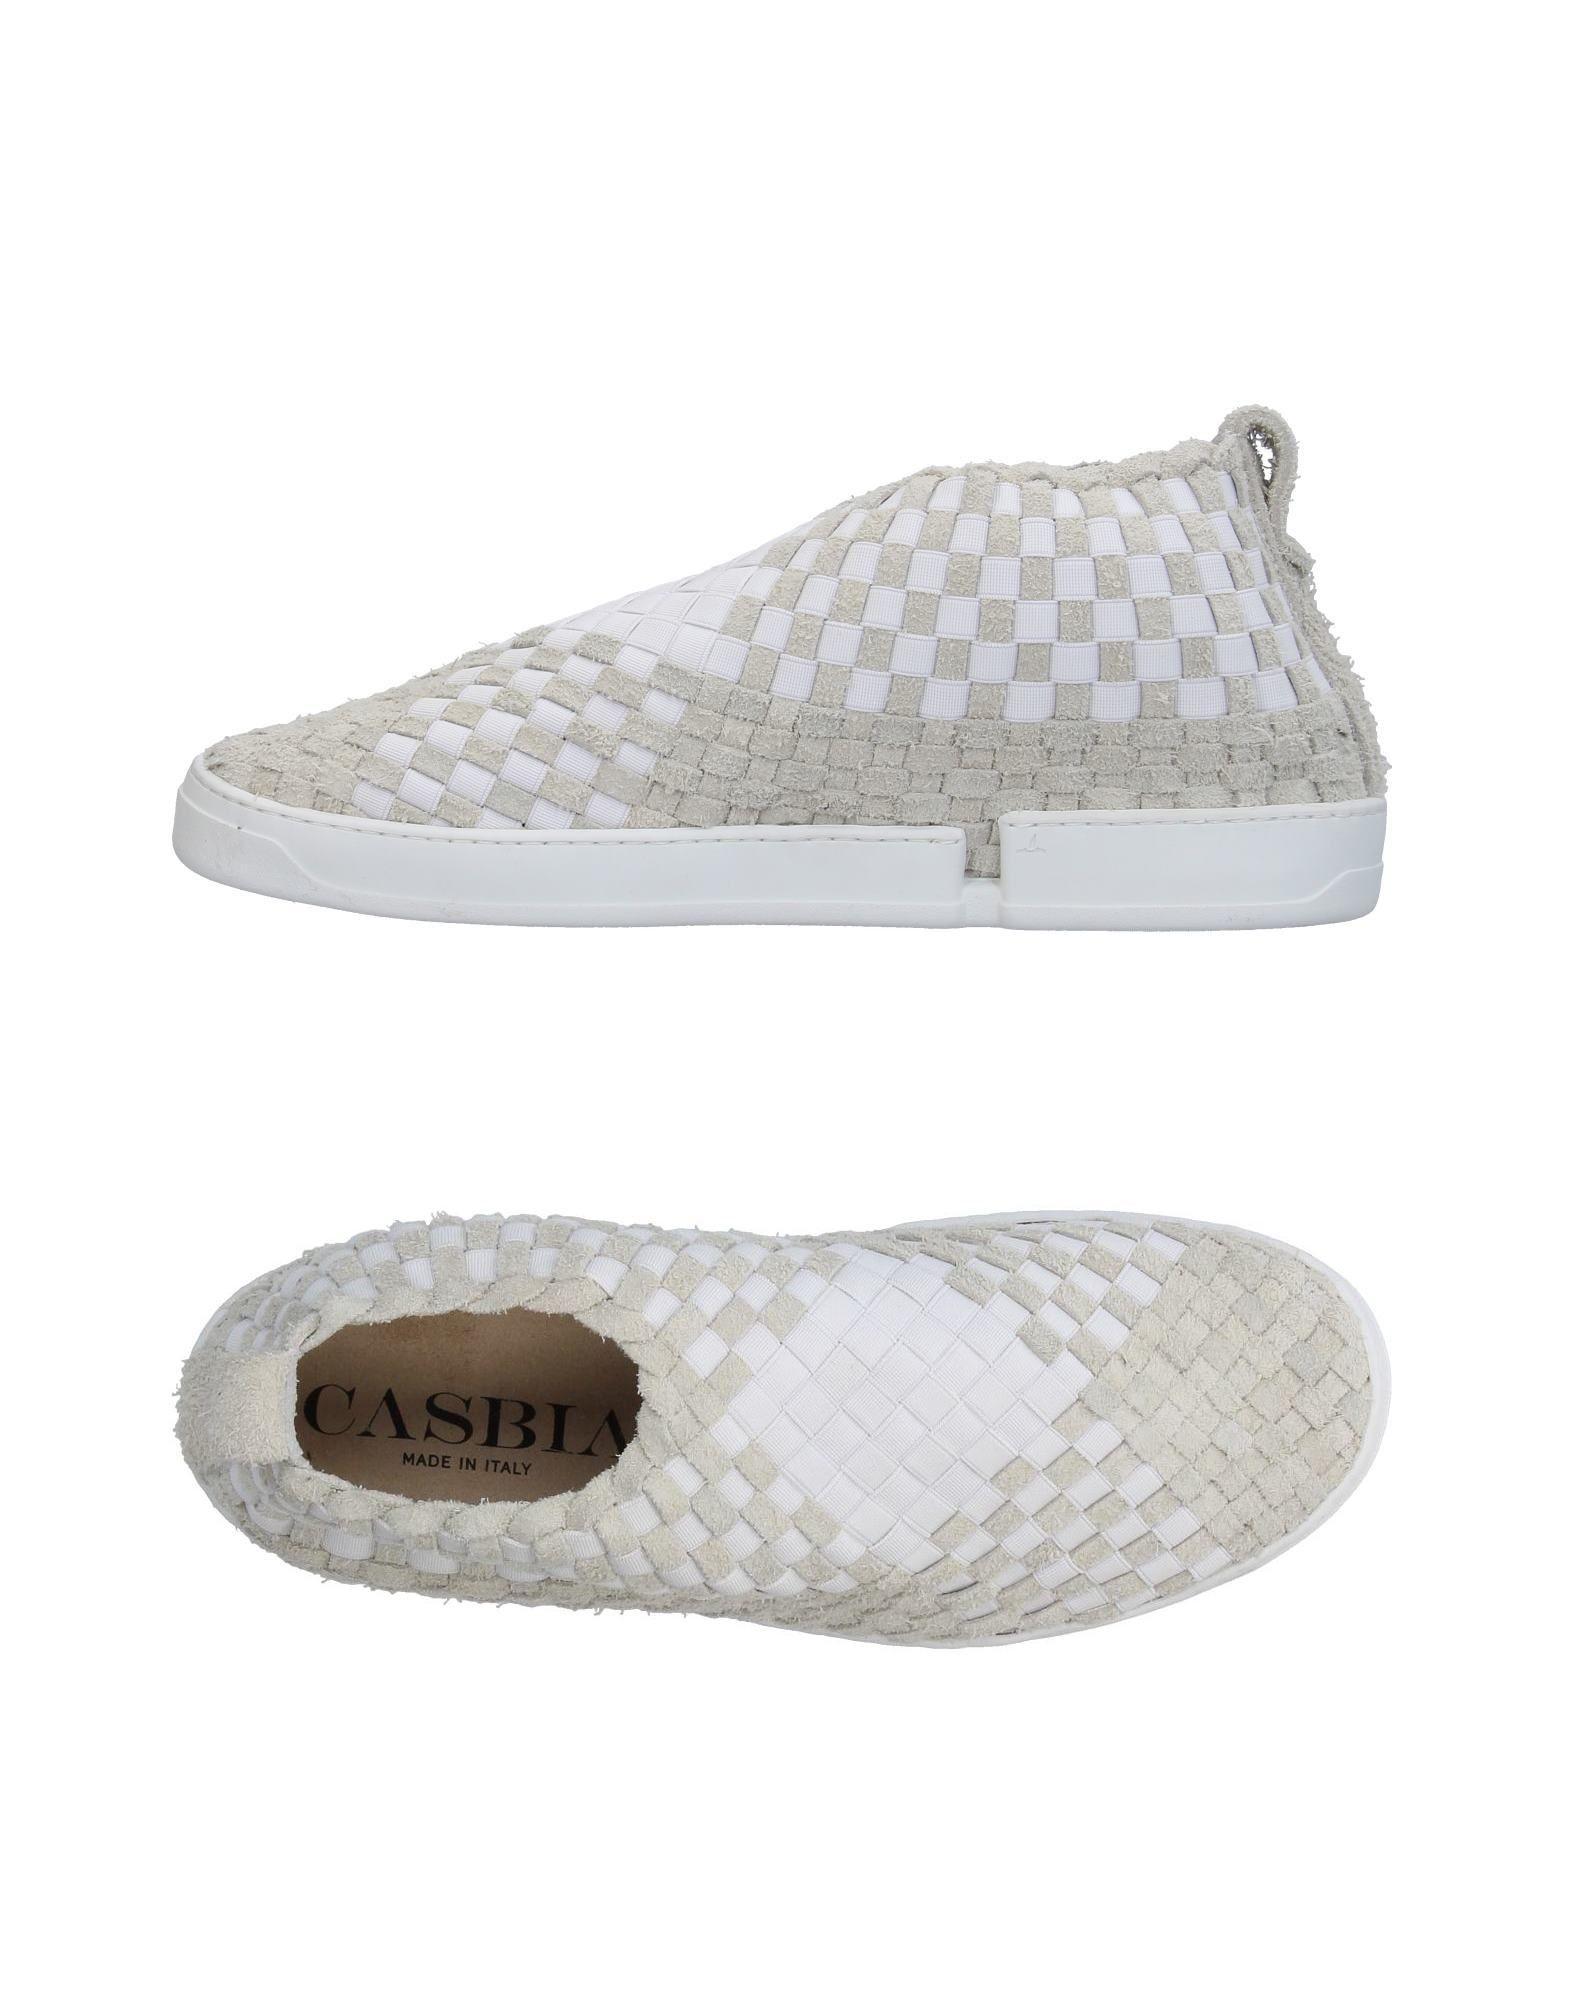 Moda Sneakers Casbia Uomo - 11406763AK